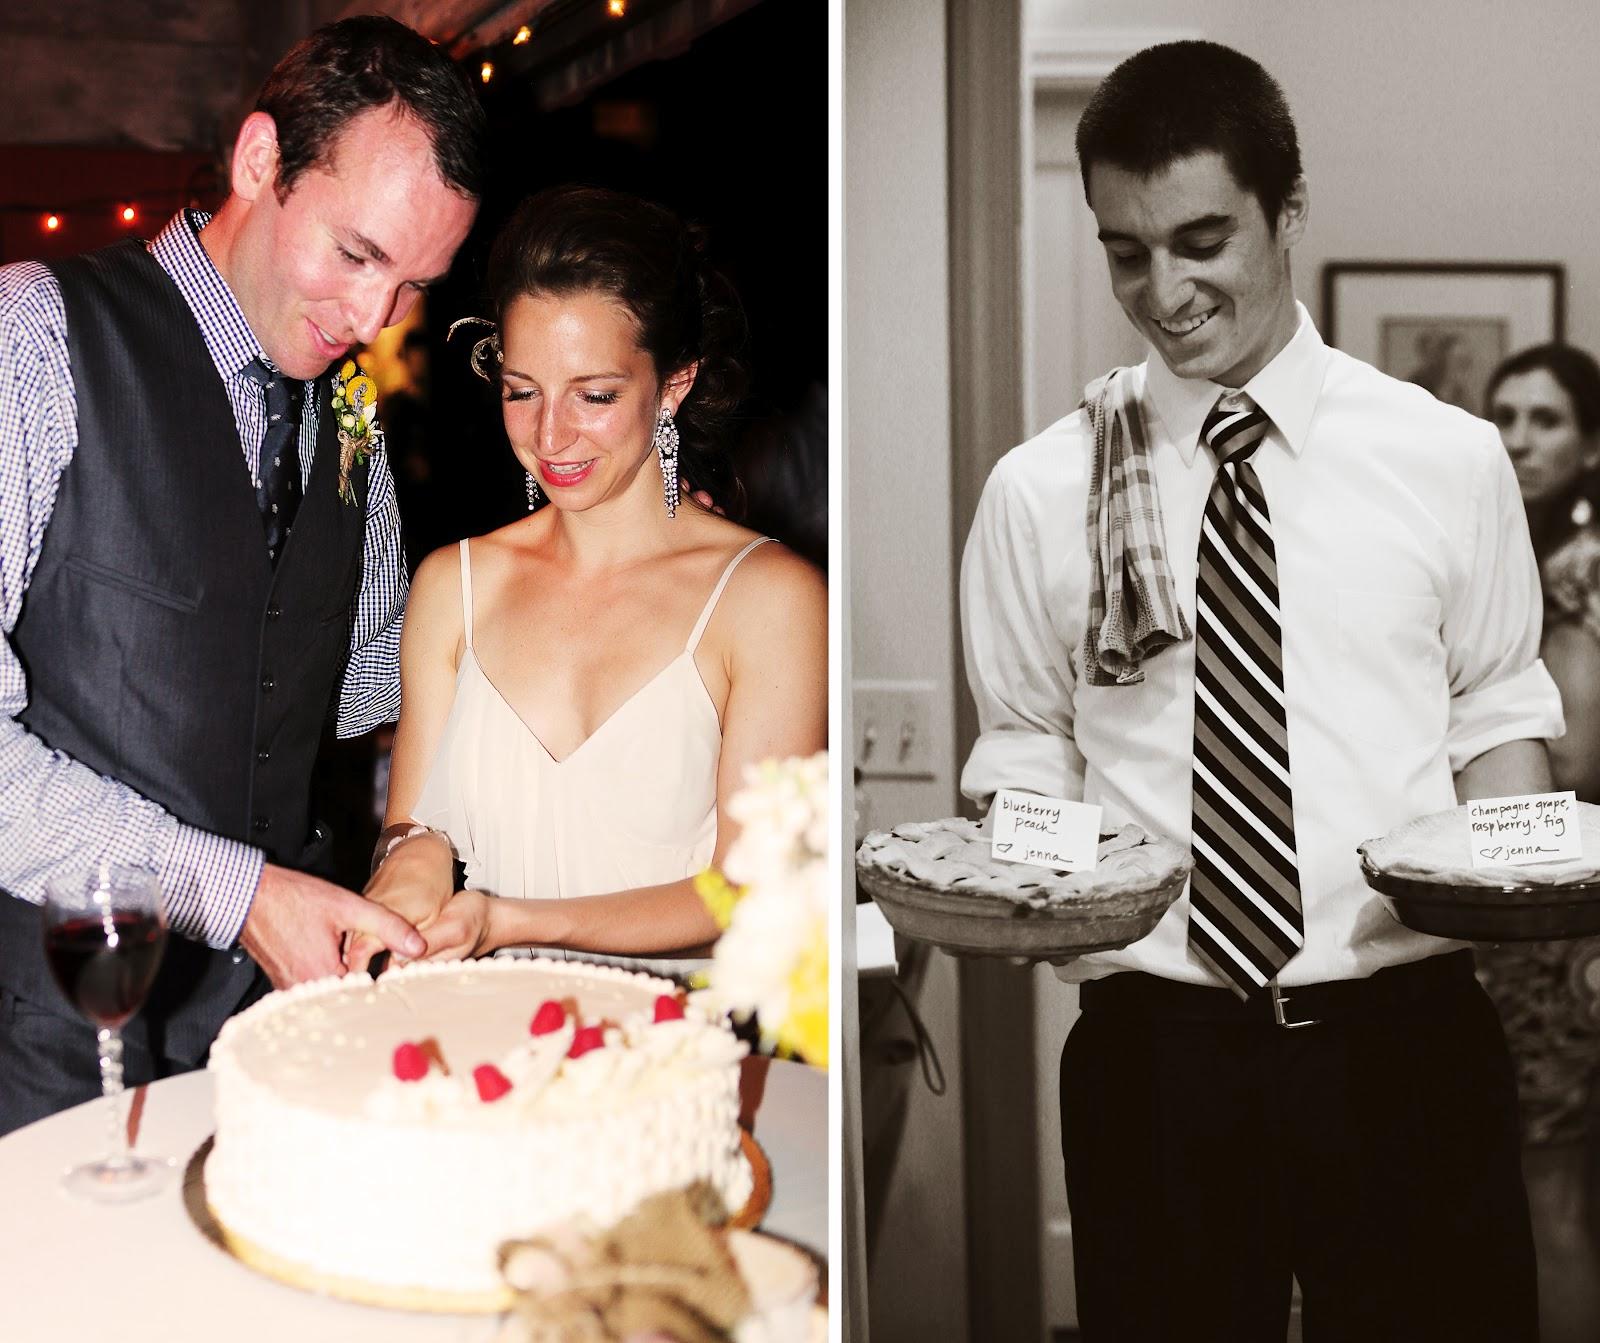 Les Beach Shabby Chic Wedding Cake Cutting Pinele Topper